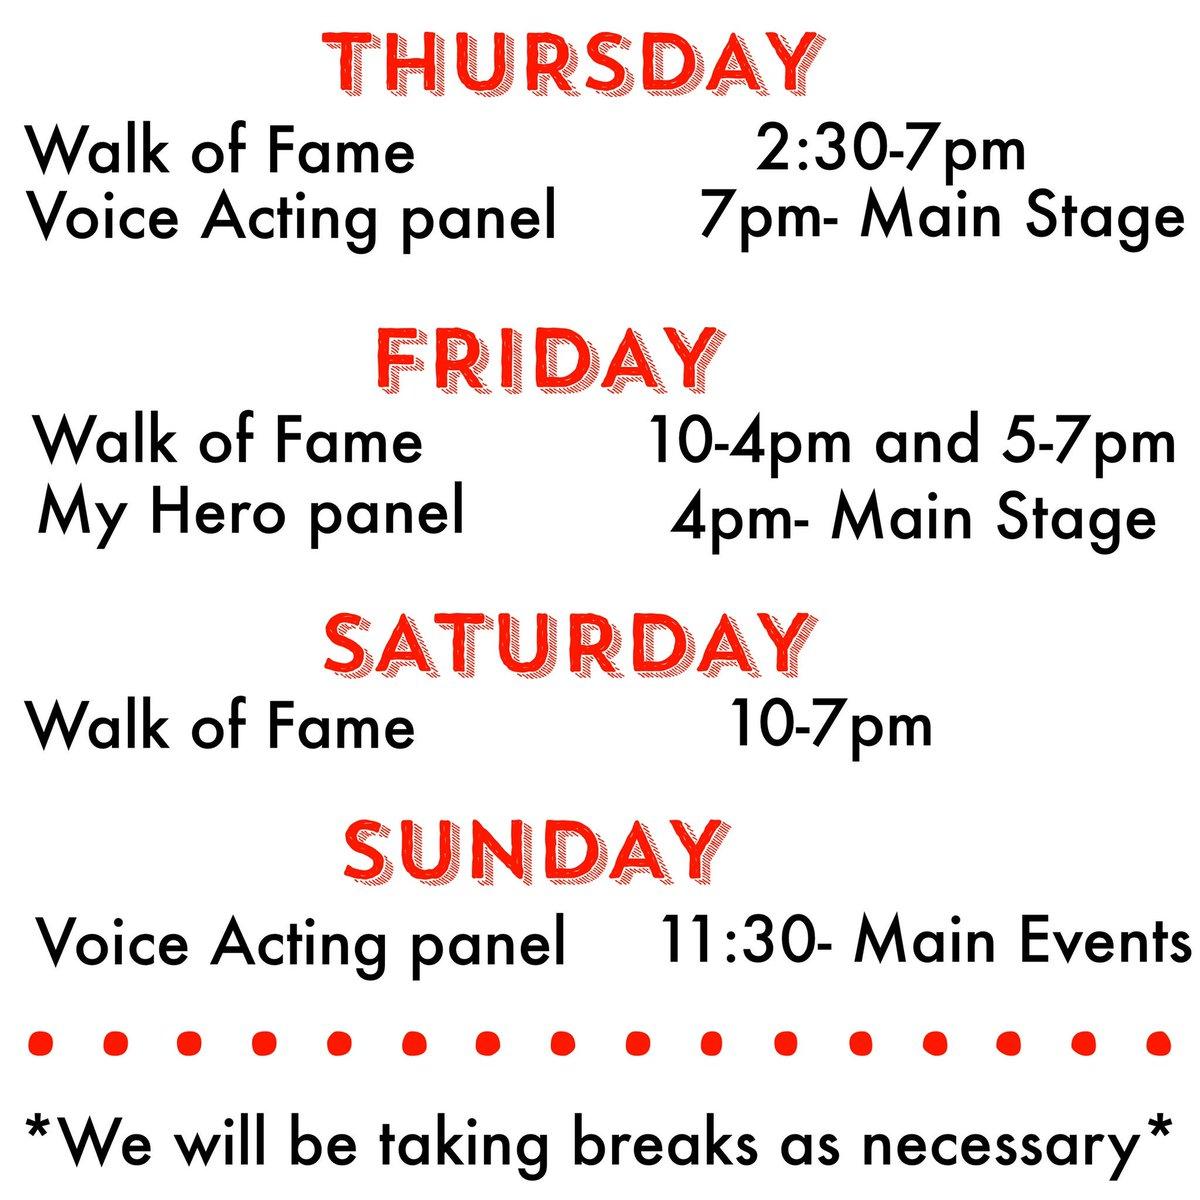 test Twitter Media - Okay #Momocon folks, here is my schedule! If you're in Atlanta this weekend come see me and @MikeFritzArt! ❤️ . #momocon2019 #animeconvention #animecon #atlanta #dragonballz #dragonballsuper #bulma #myheroacademia #myhero #froppy #fairytail #mirajanestrauss #genlock #colonelmarin https://t.co/NyKjM9APMs